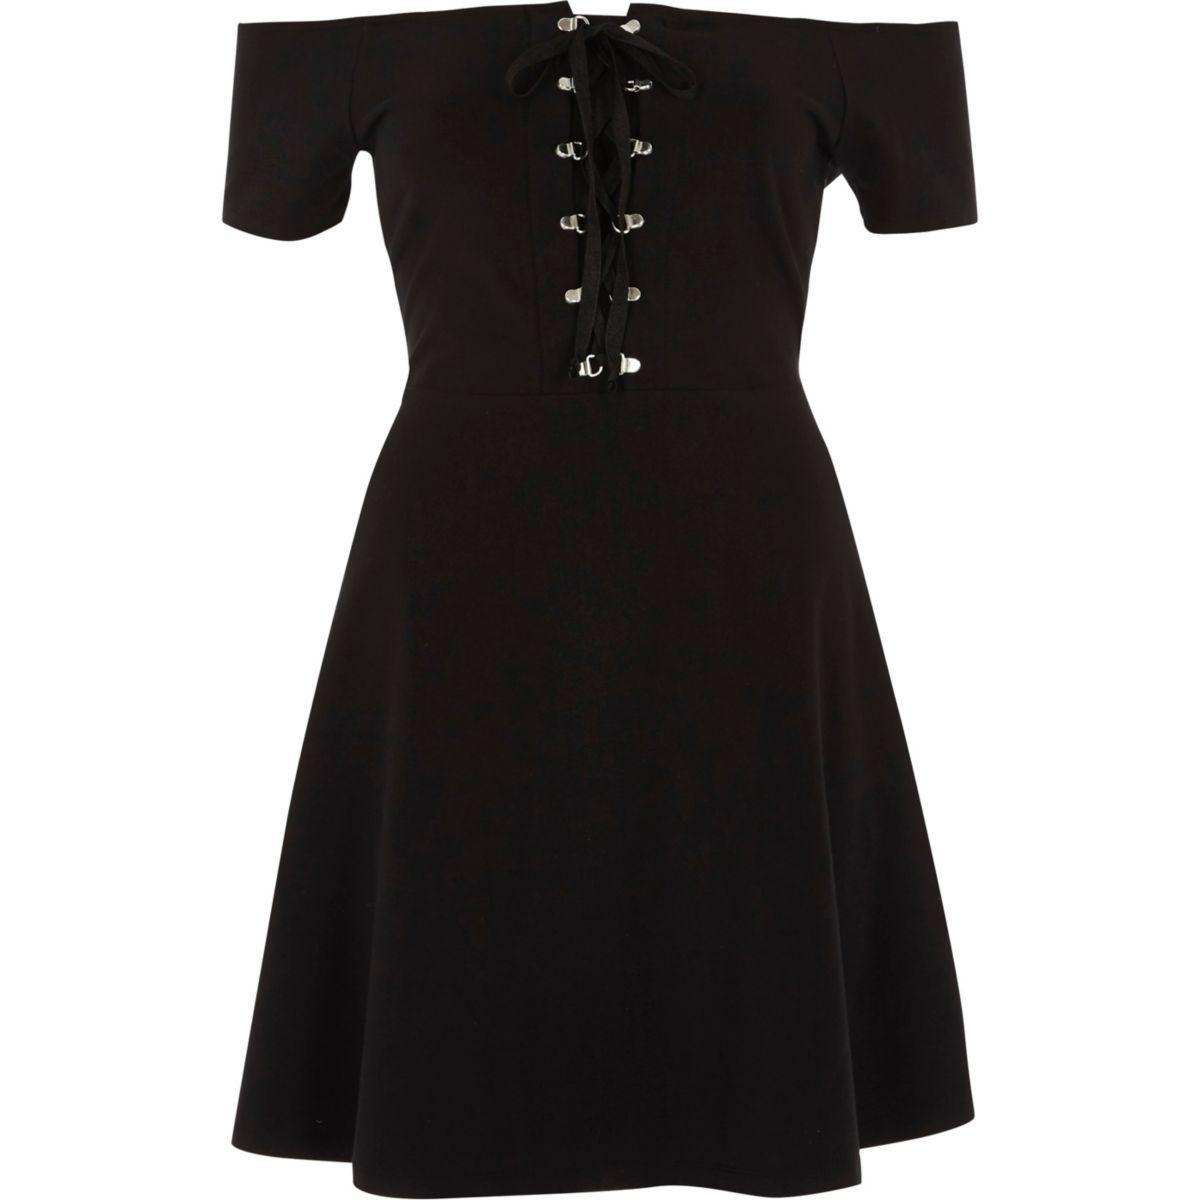 Black bardot lace up front skater dress